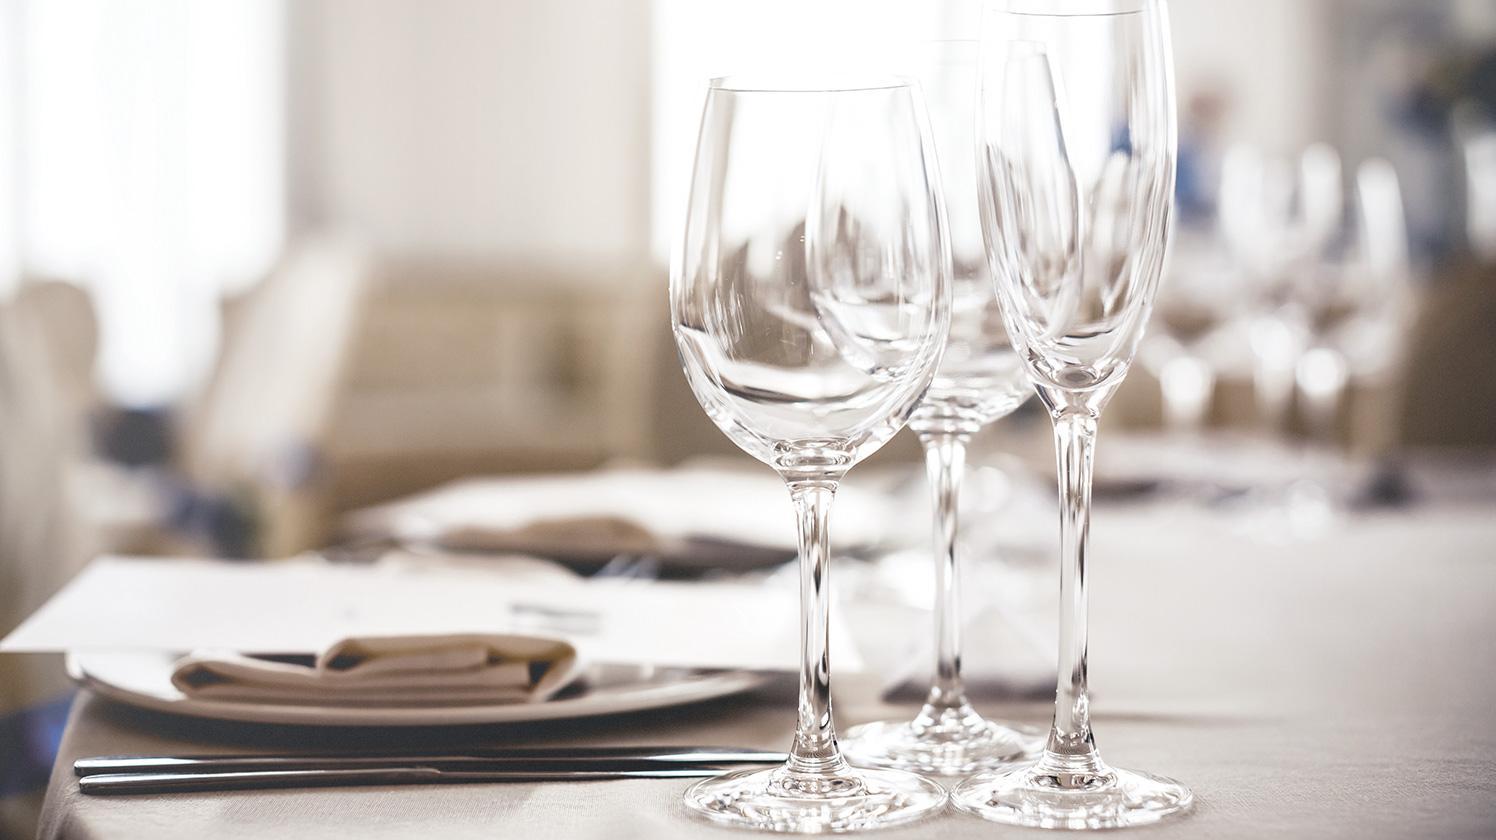 BRITA Filter PURITY Clean Gehobenes Restaurant